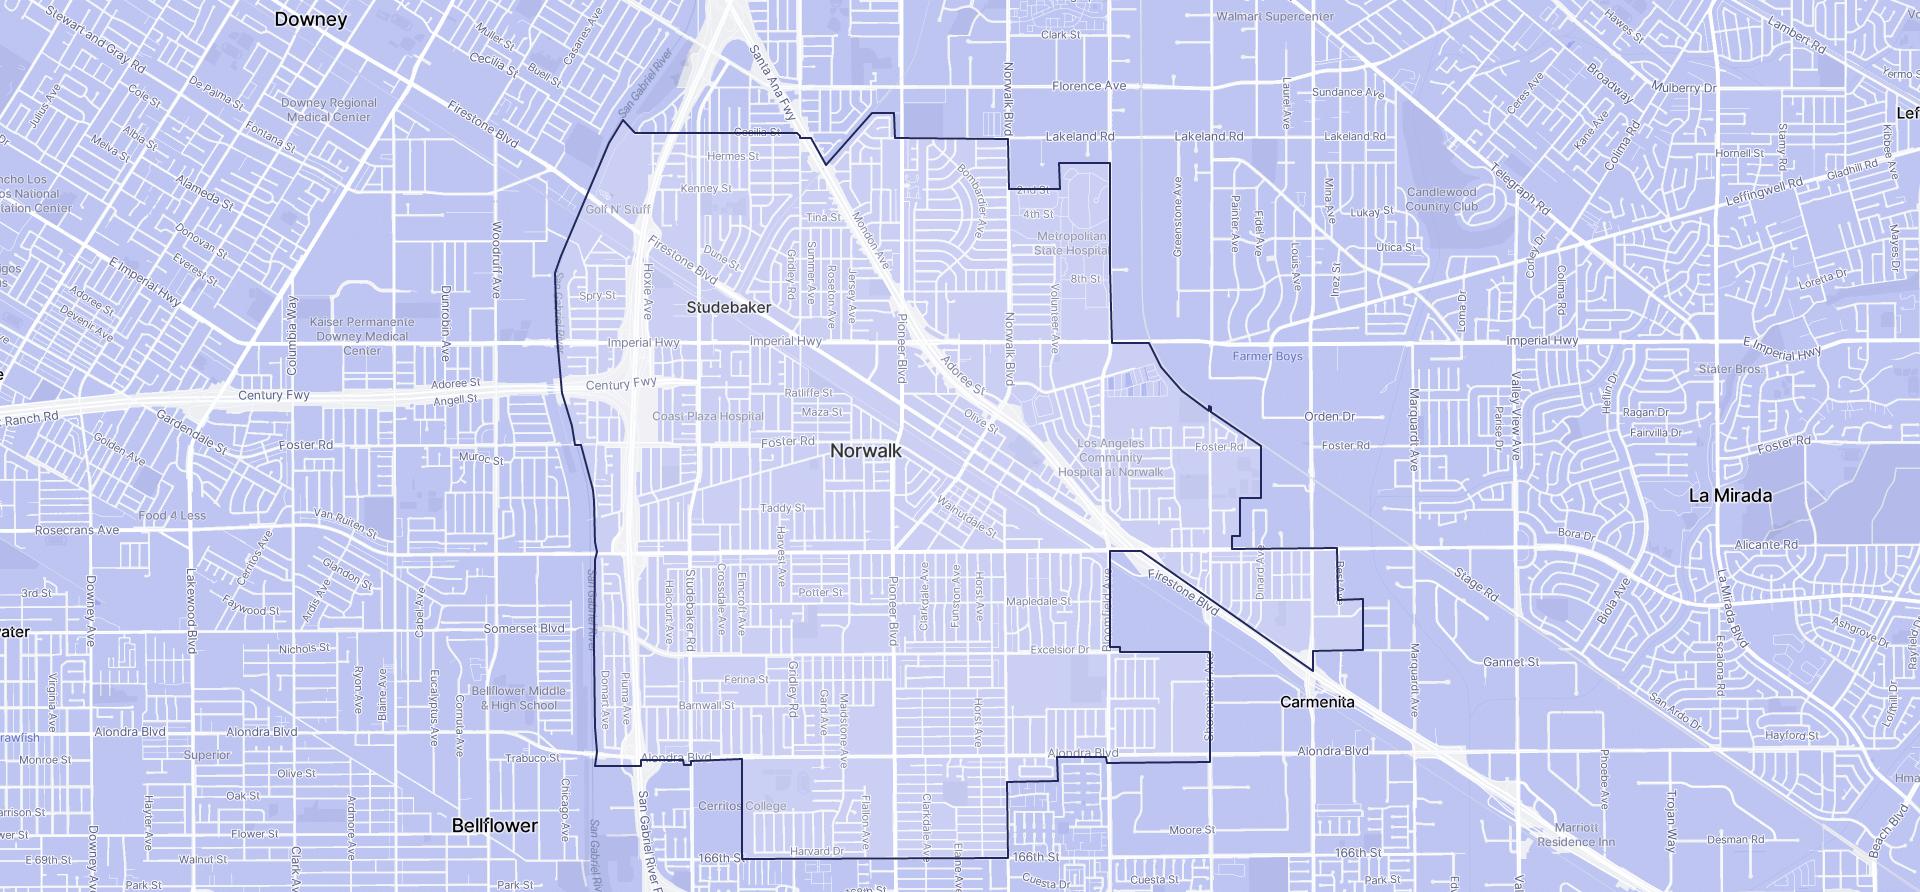 Image of Norwalk boundaries on a map.